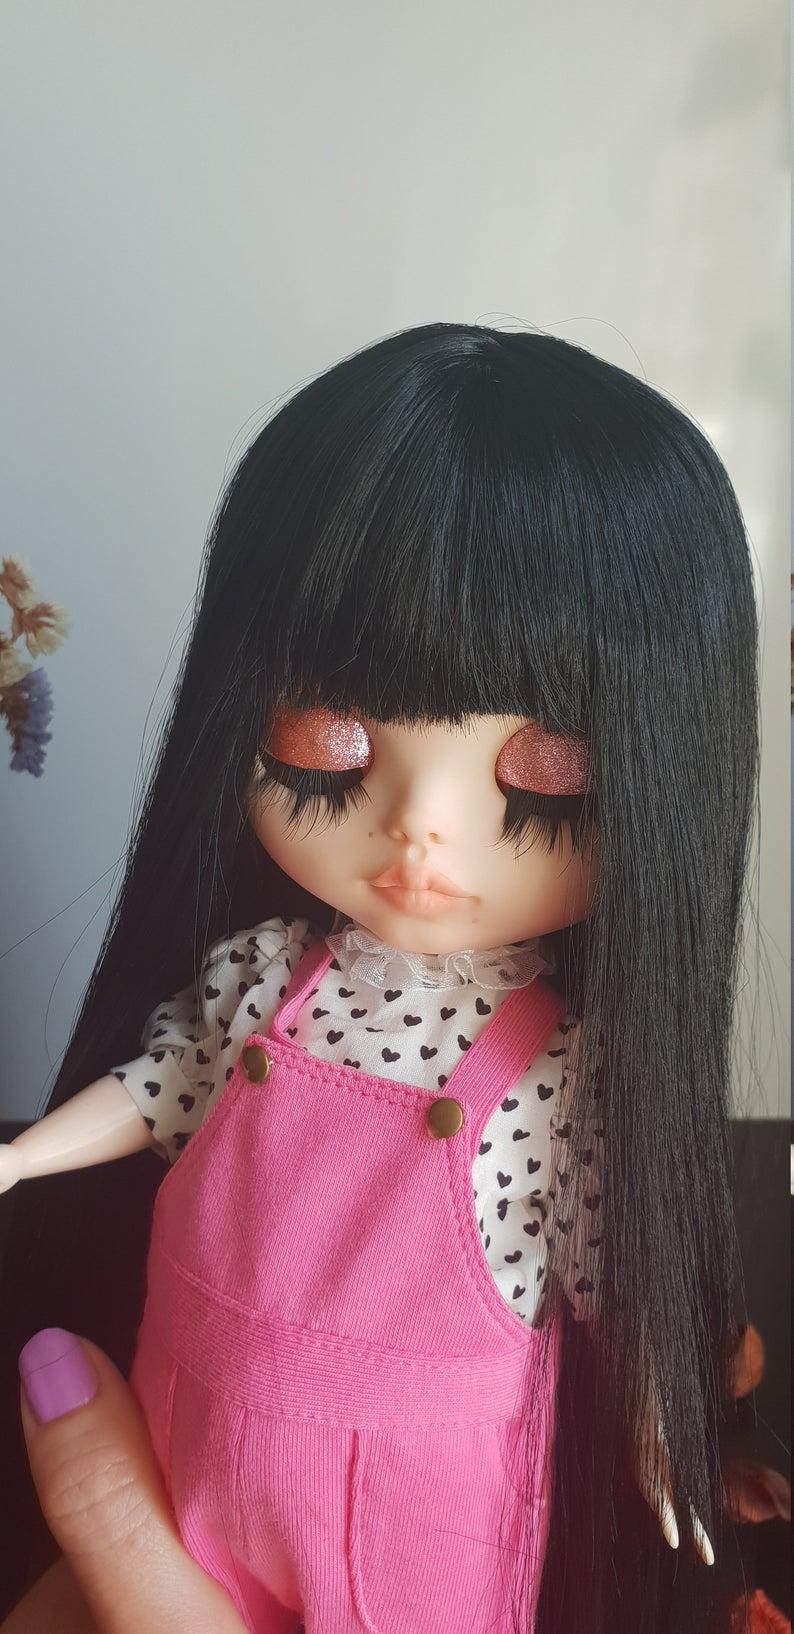 Nadine - Custom Blythe Doll One-Of-A-Kind OOAK Sold-out Custom Blythes